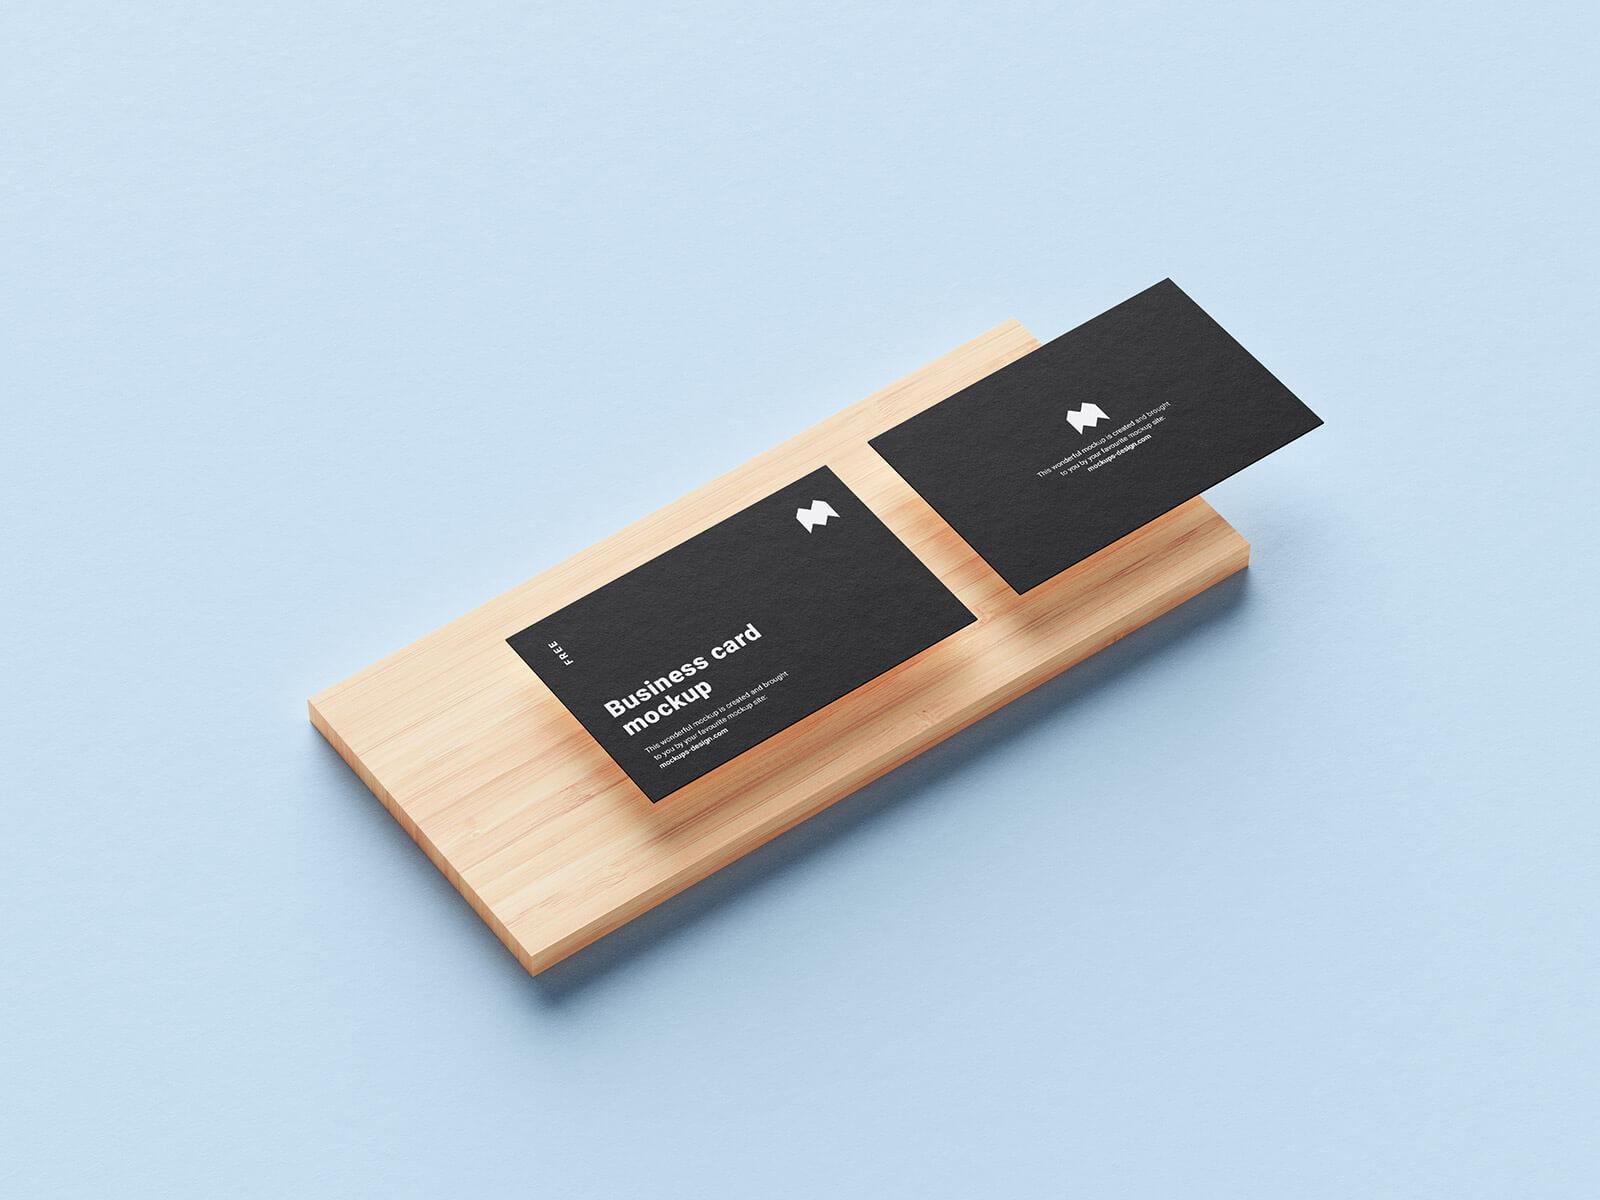 Free Business Card On Wooden Slab Mockup PSD